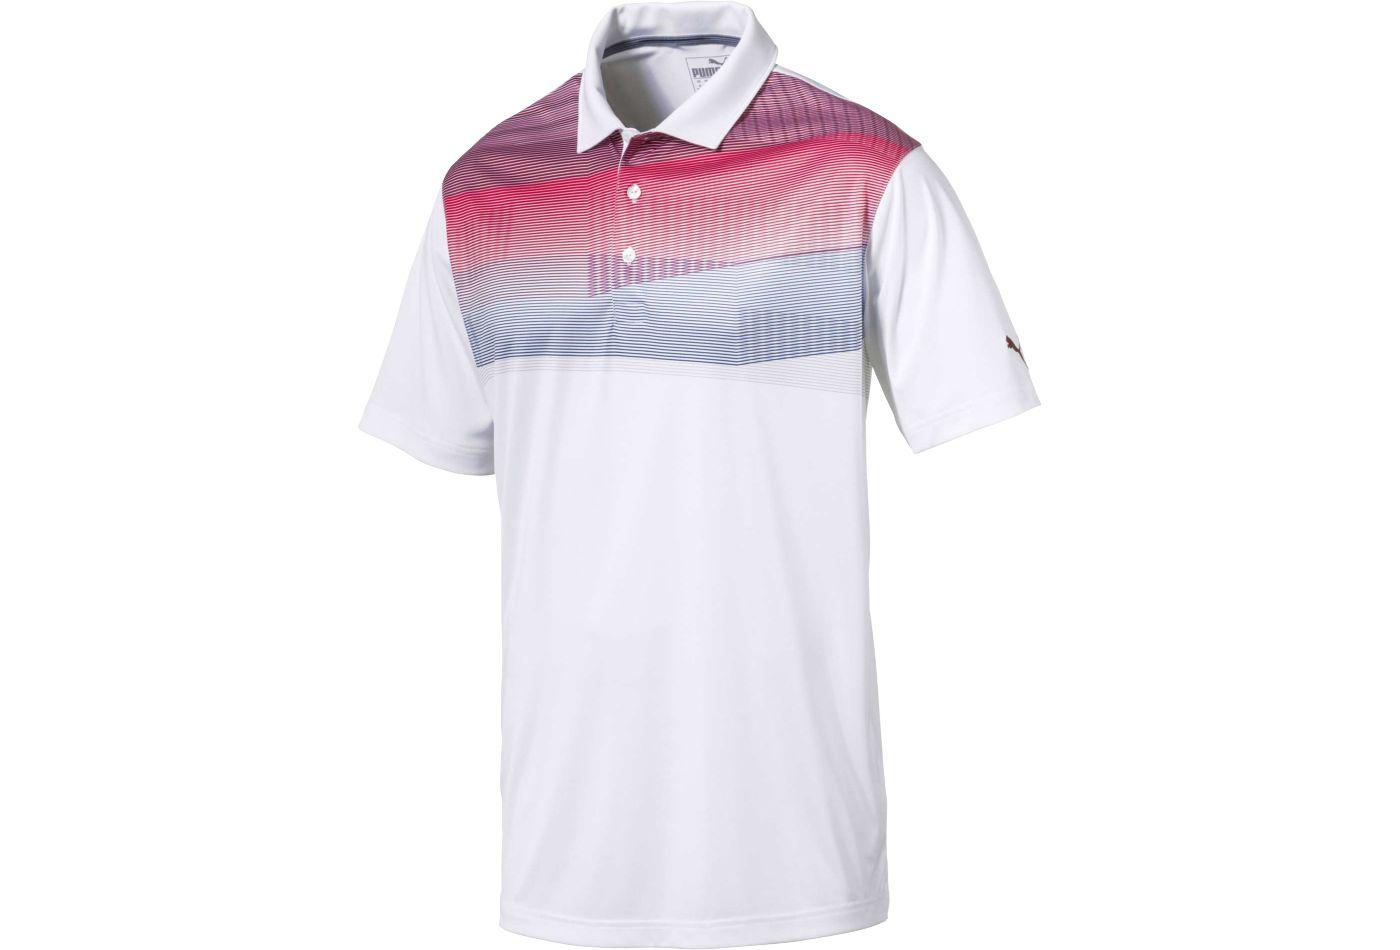 PUMA Men's PWRCOOL Refract Golf Polo